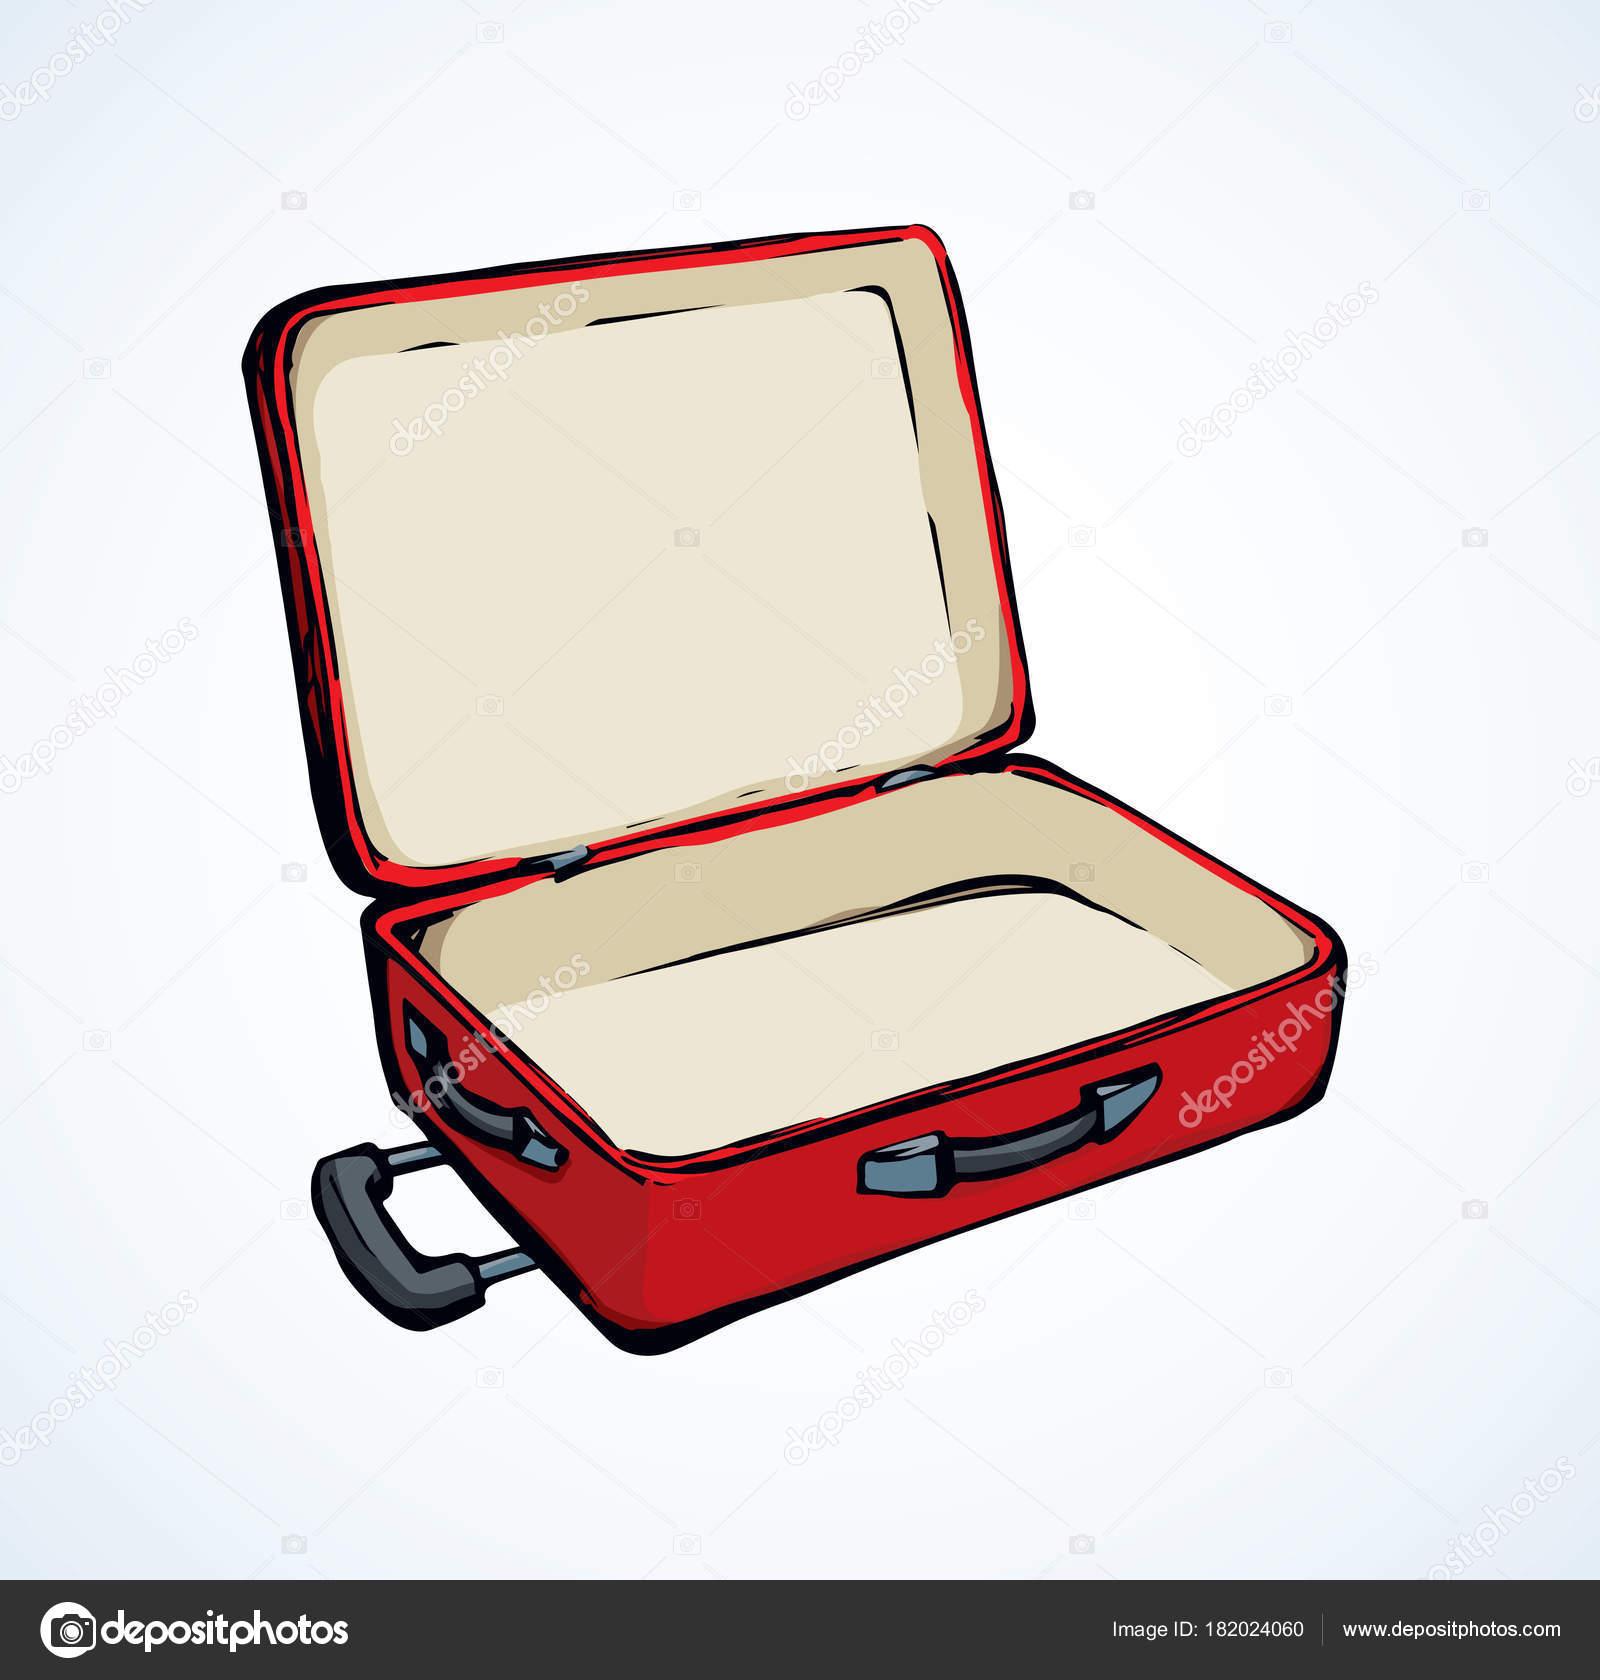 Valise dessin vectoriel image vectorielle marinka - Dessin de valise ...